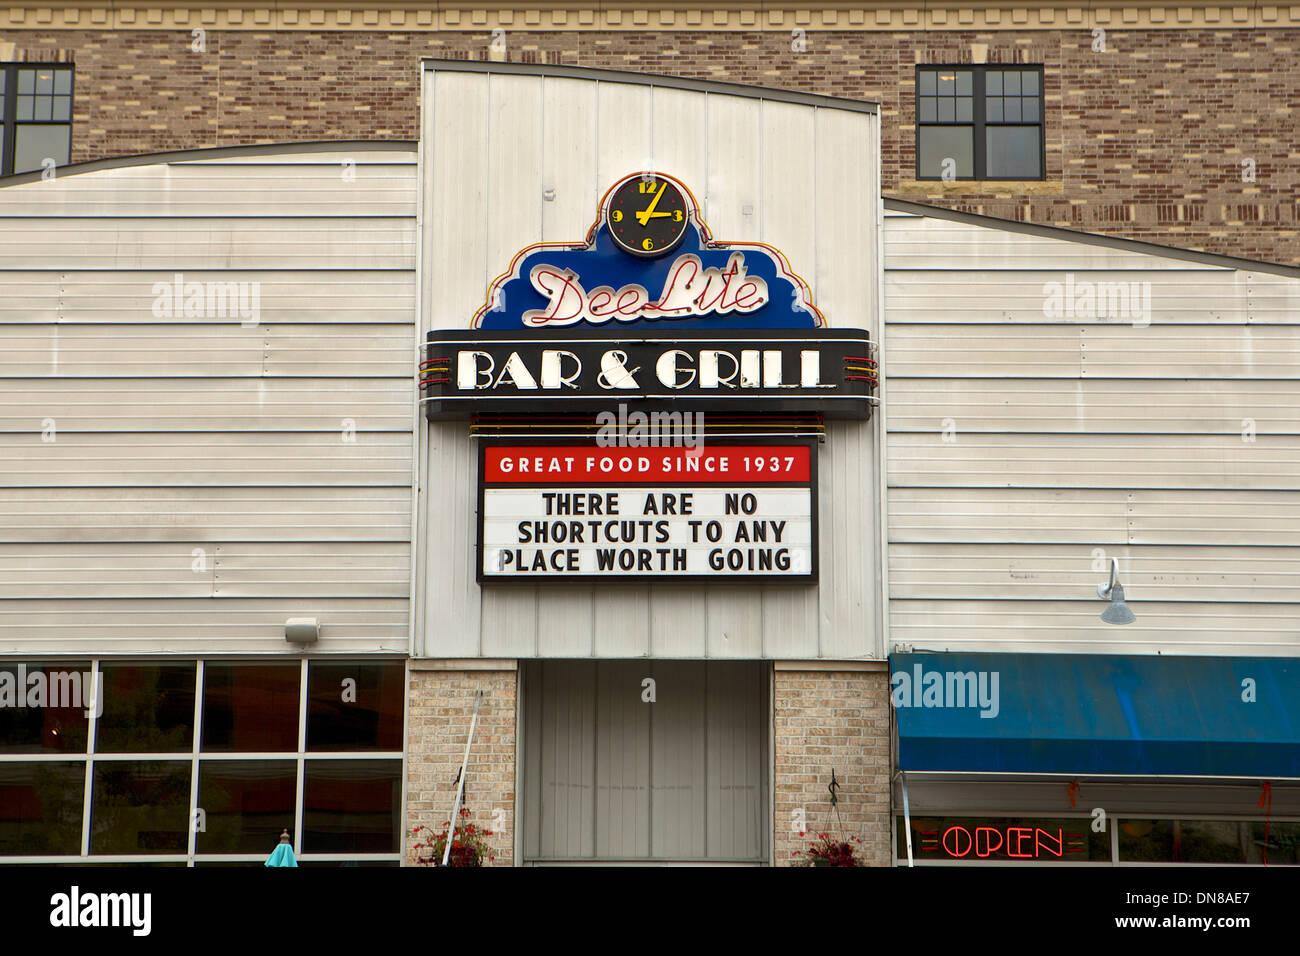 Dee Lite Bar & Grill in Grand Haven, Michigan - Stock Image